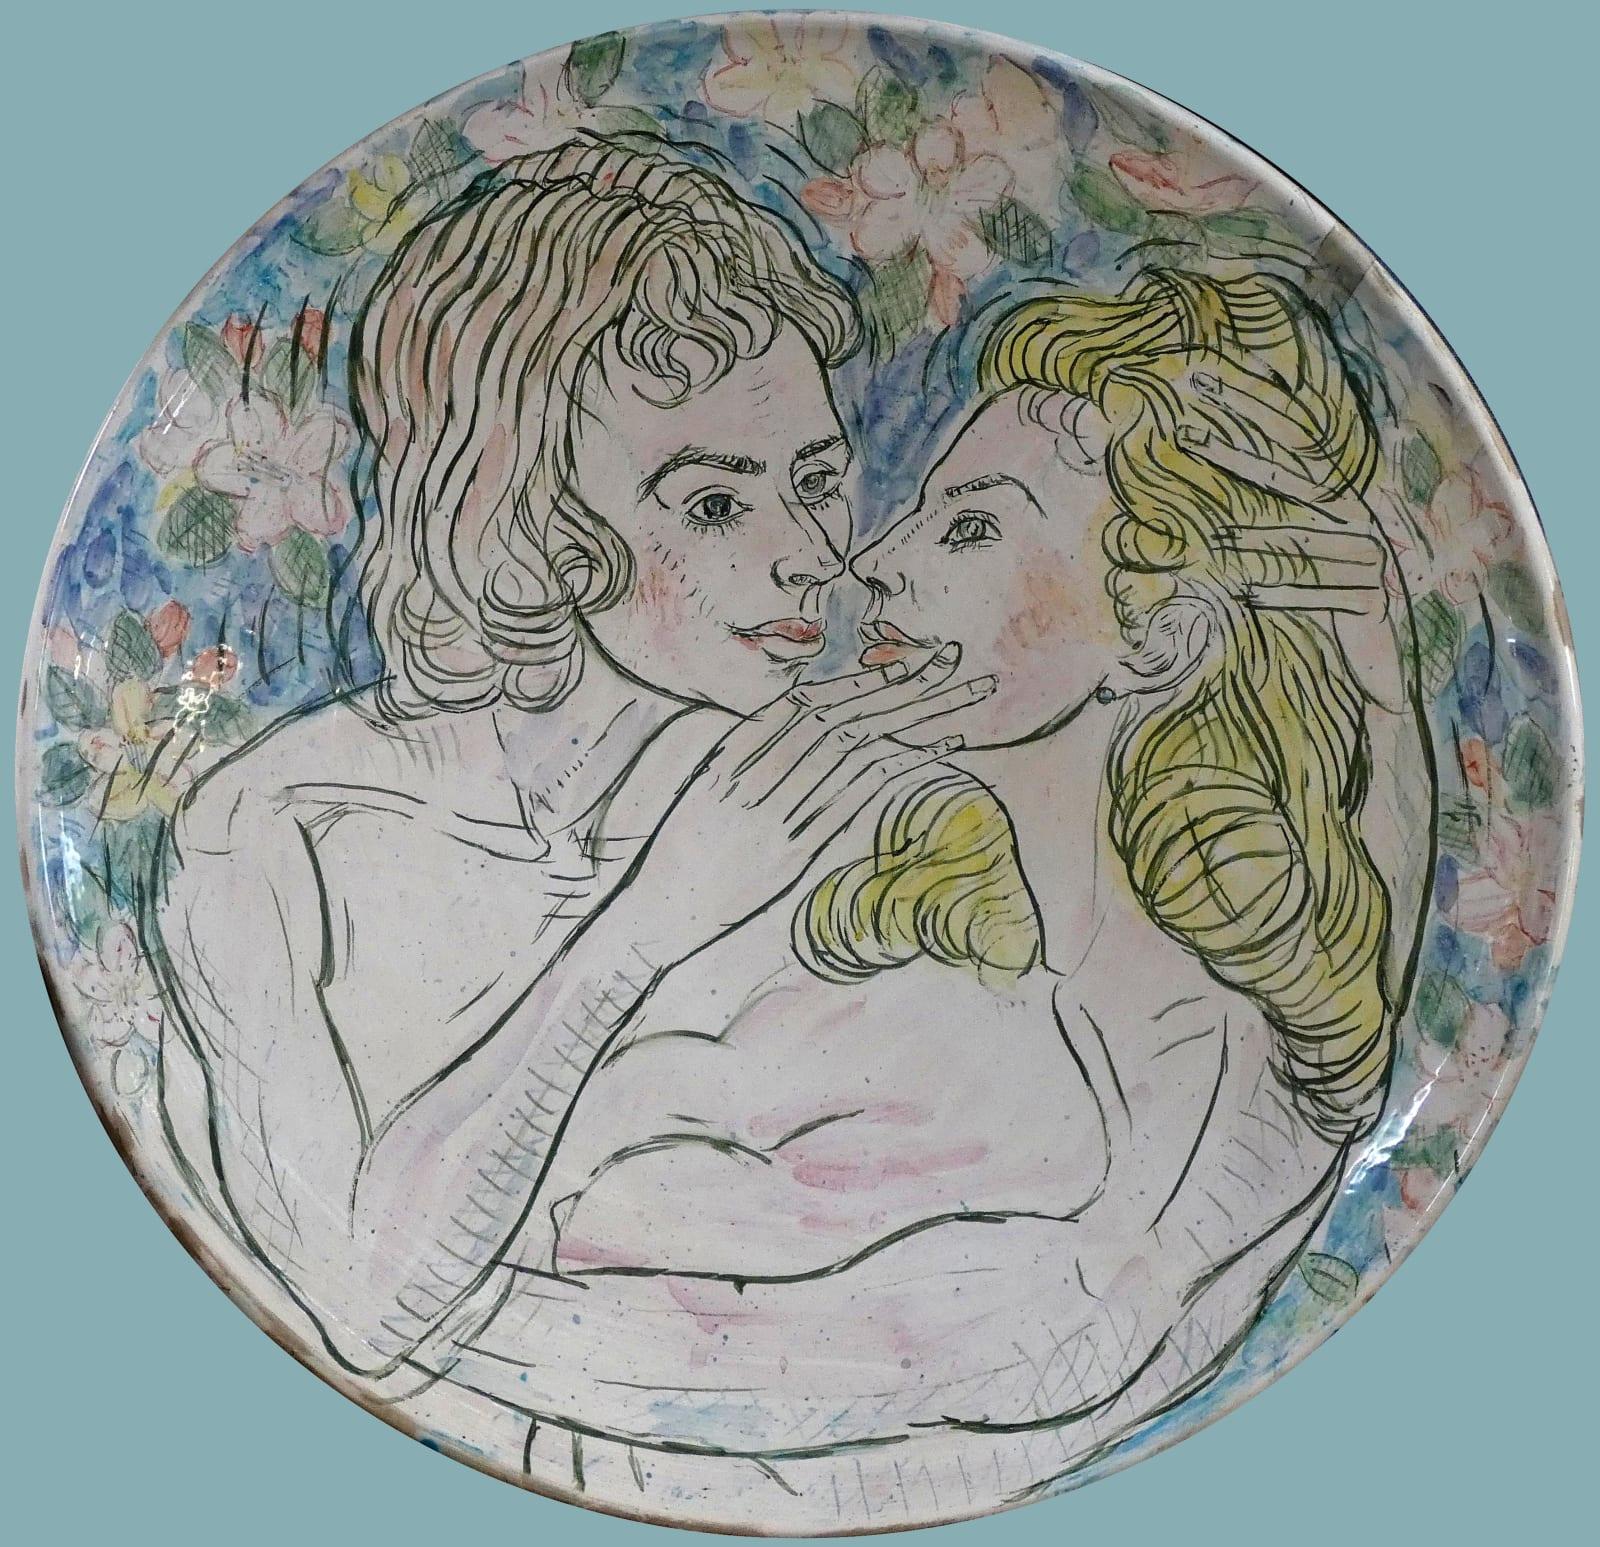 Leonard Mccomb, Two lovers, 1992